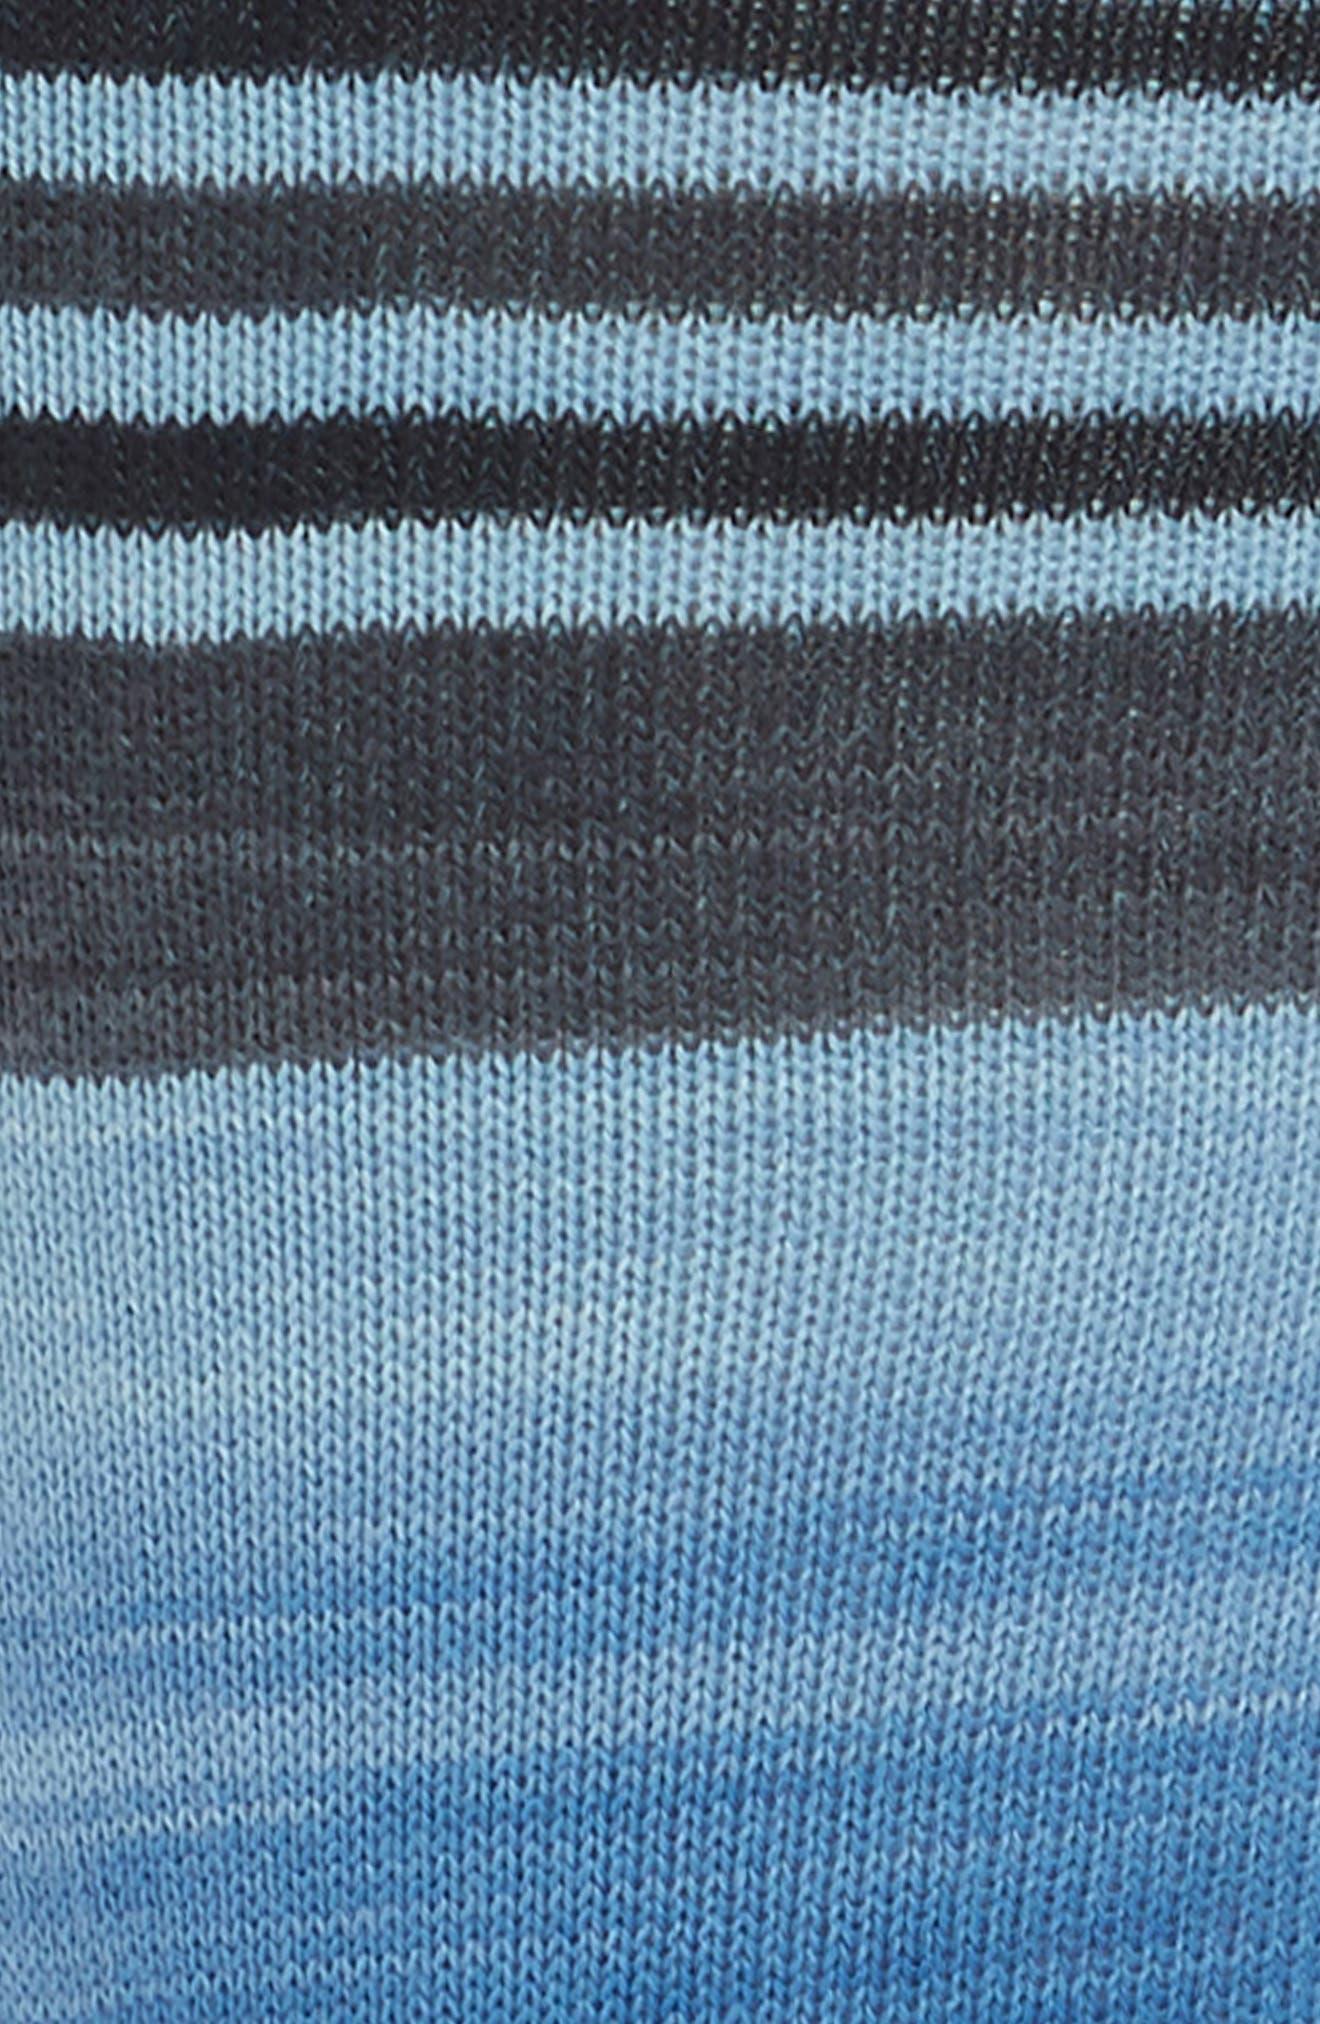 Space Dye Striped Socks,                             Alternate thumbnail 2, color,                             Royal Blue